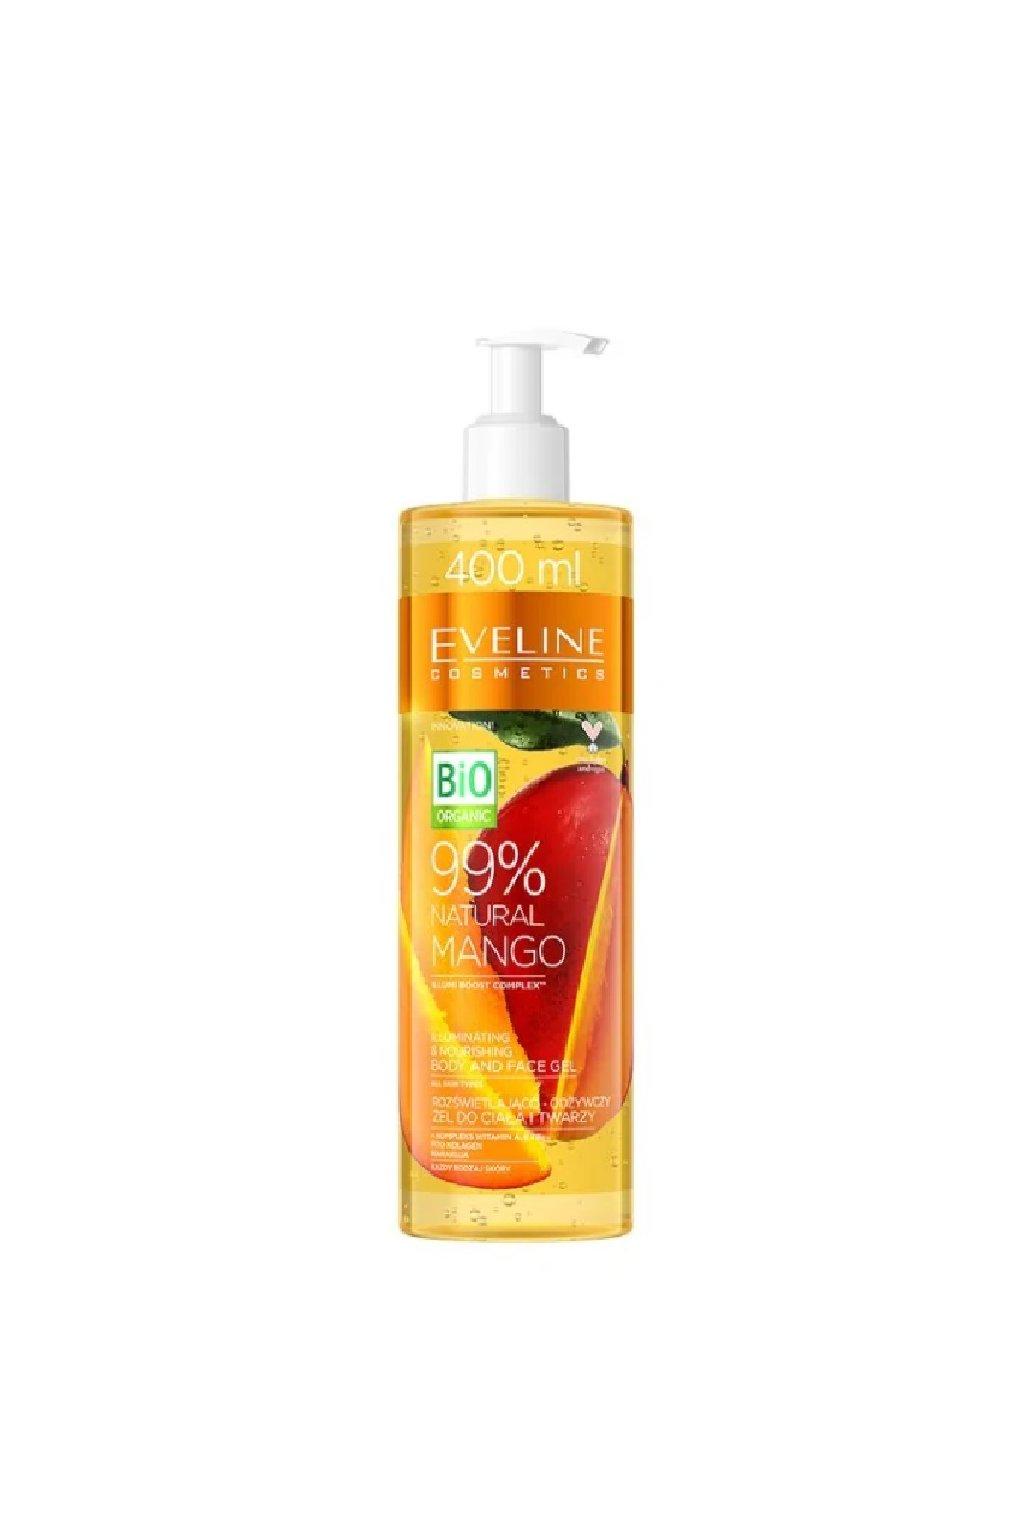 Eveline cosmetics Bio Organic 99 Natural mango body and face gel 400ml 1